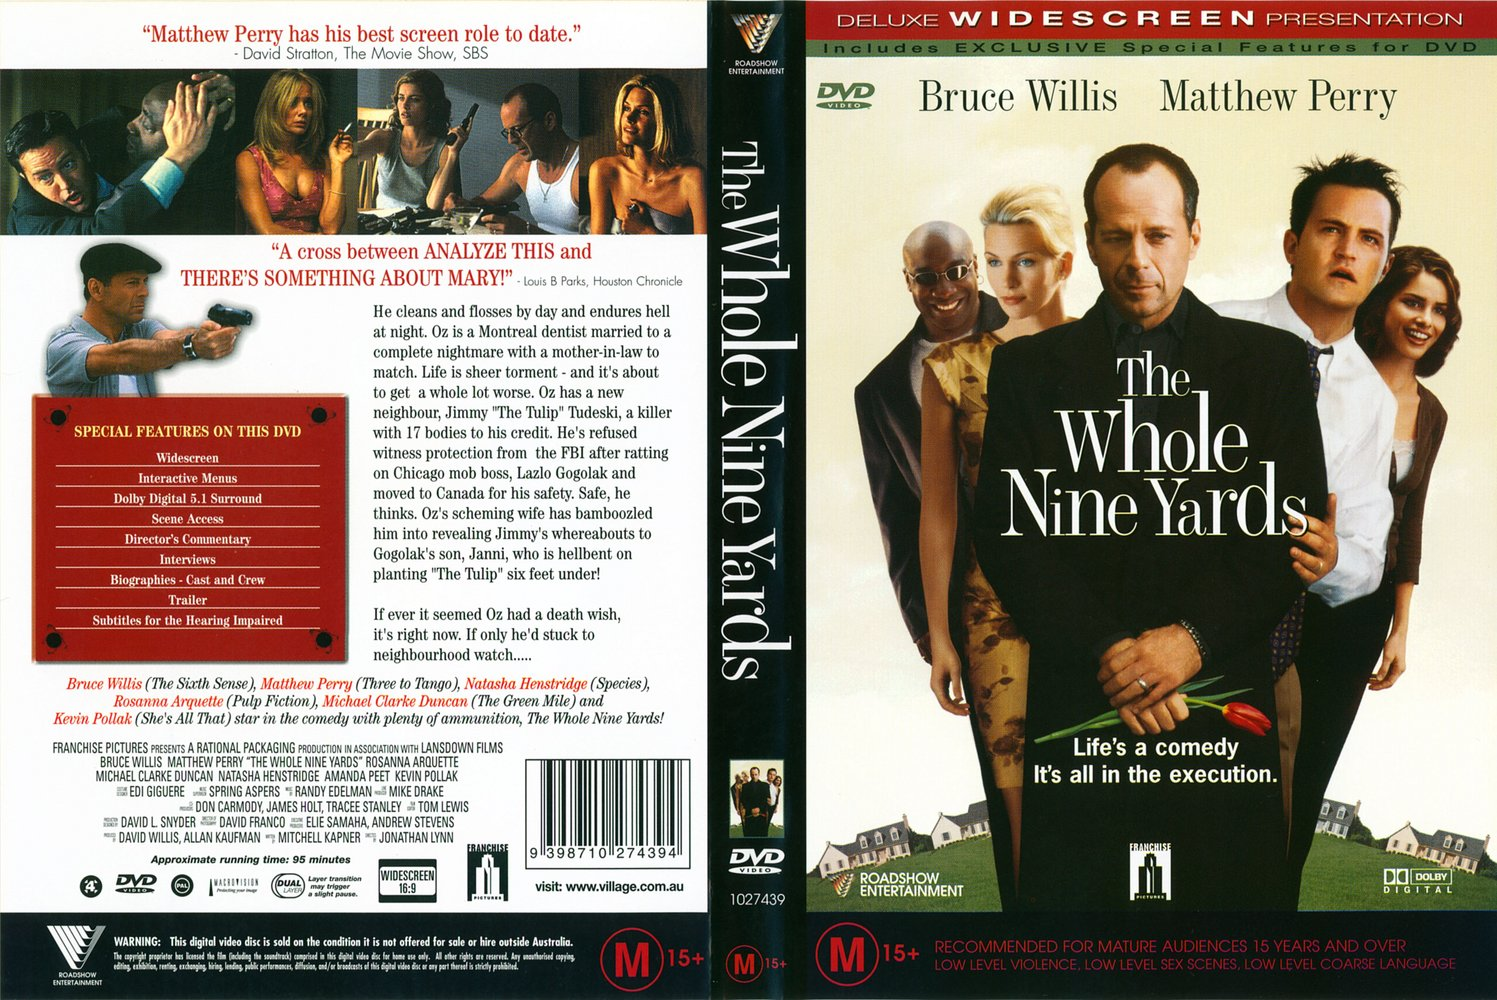 http://1.bp.blogspot.com/-ftkTfQ_Z8l0/ThkUeU_n85I/AAAAAAAABIs/8gX0uO44phI/s1600/The+Whole+Nine+Yards+FRONT1.jpg